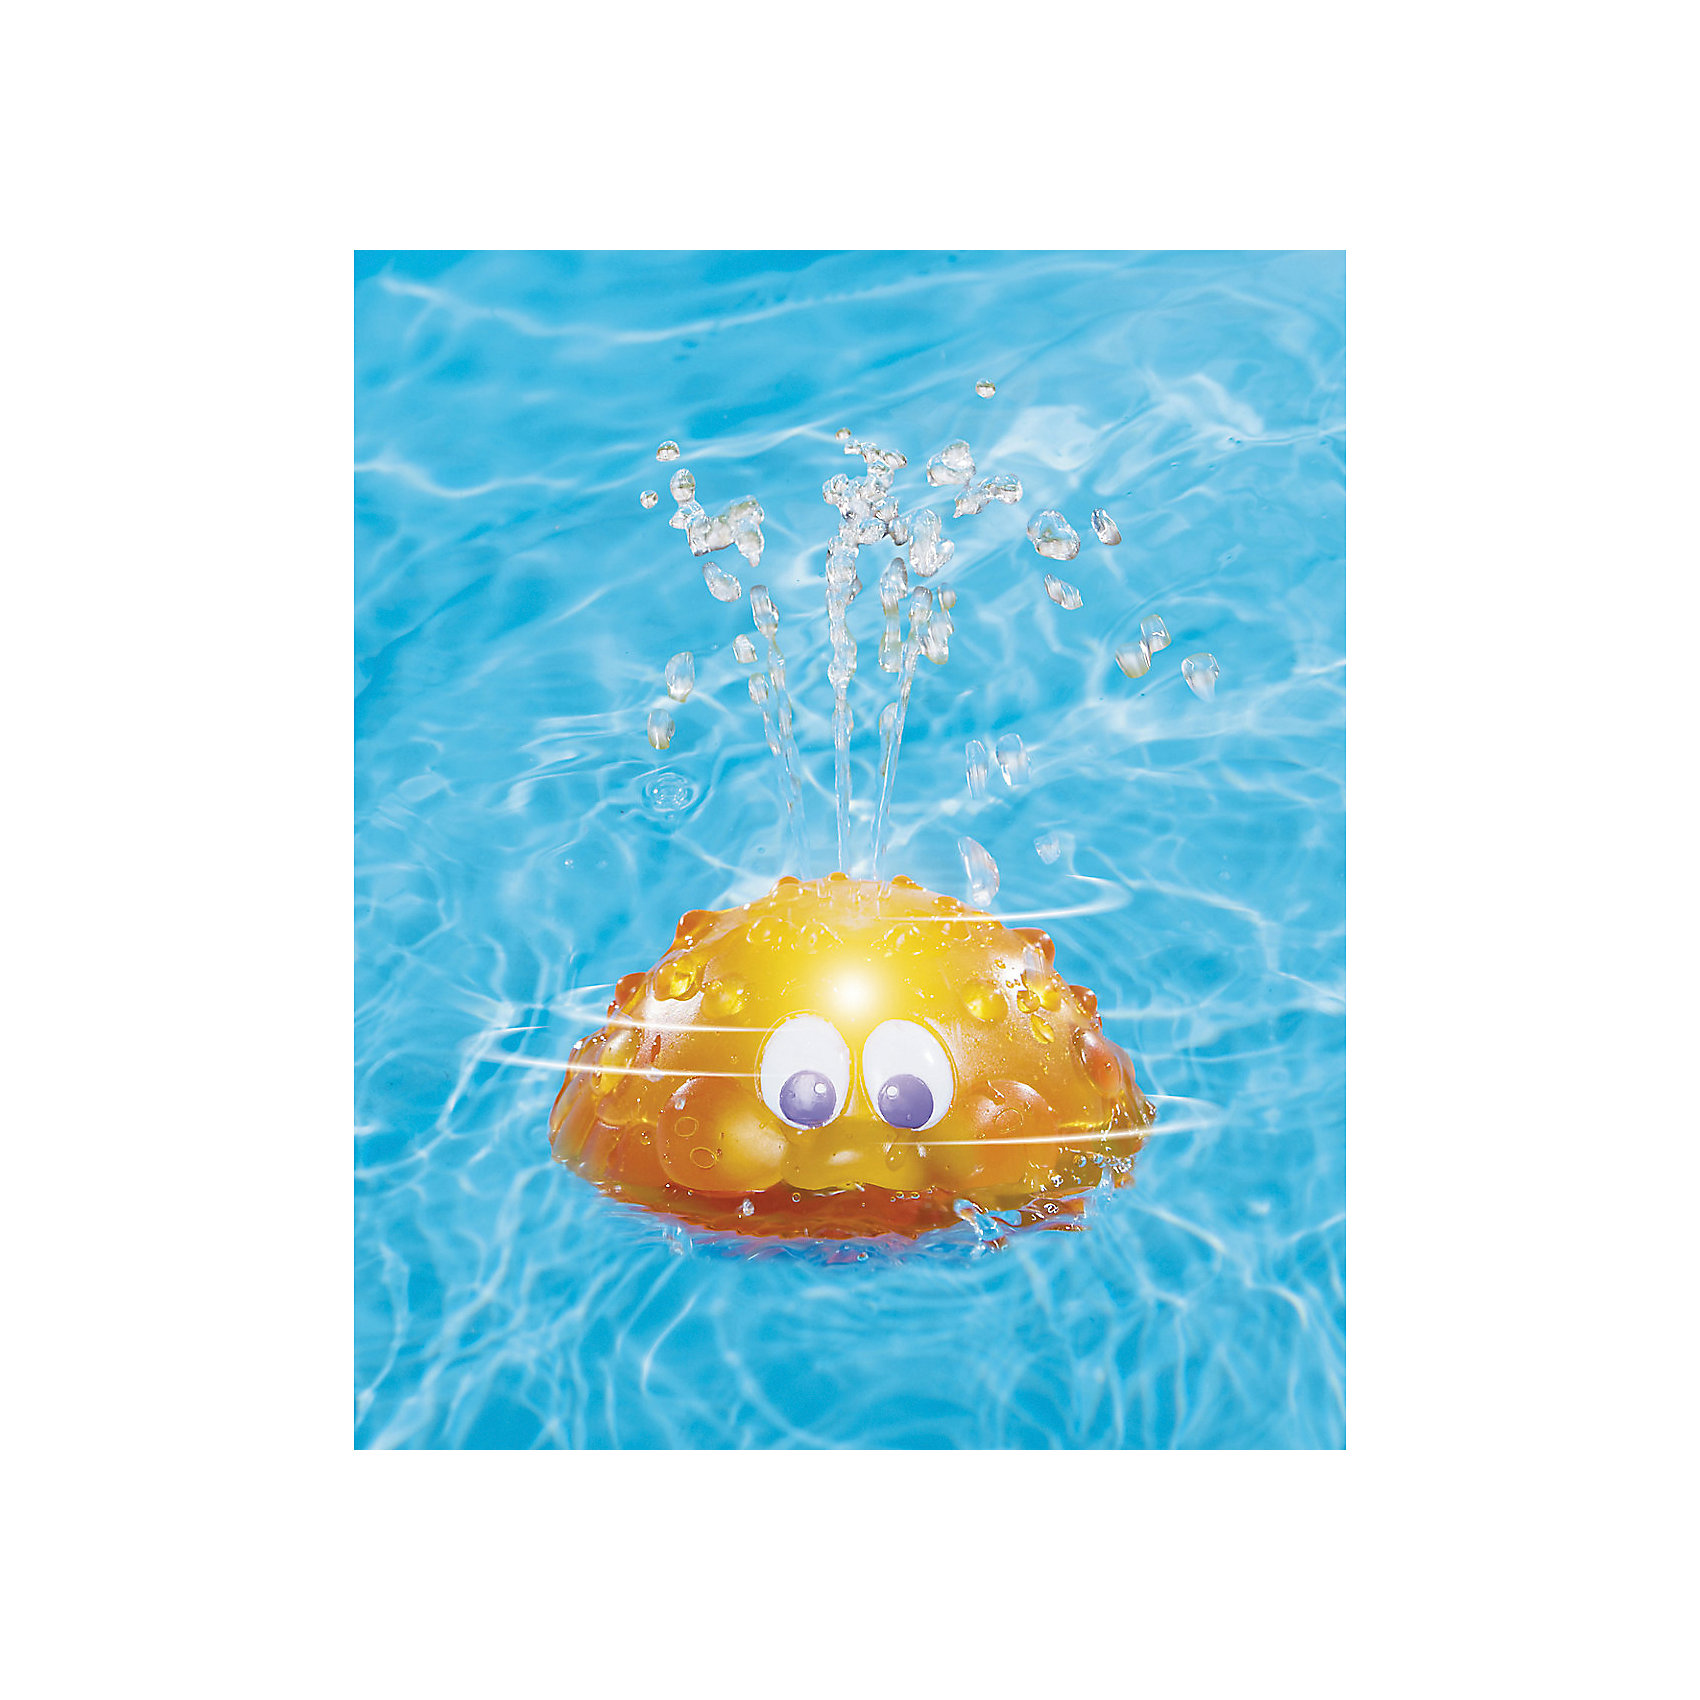 Little Tikes Игрушка для ванны Вращающийся фонтан, Little Tikes, жёлтый органайзер little tikes органайзер карман для детских принадлежностей seat pal серый